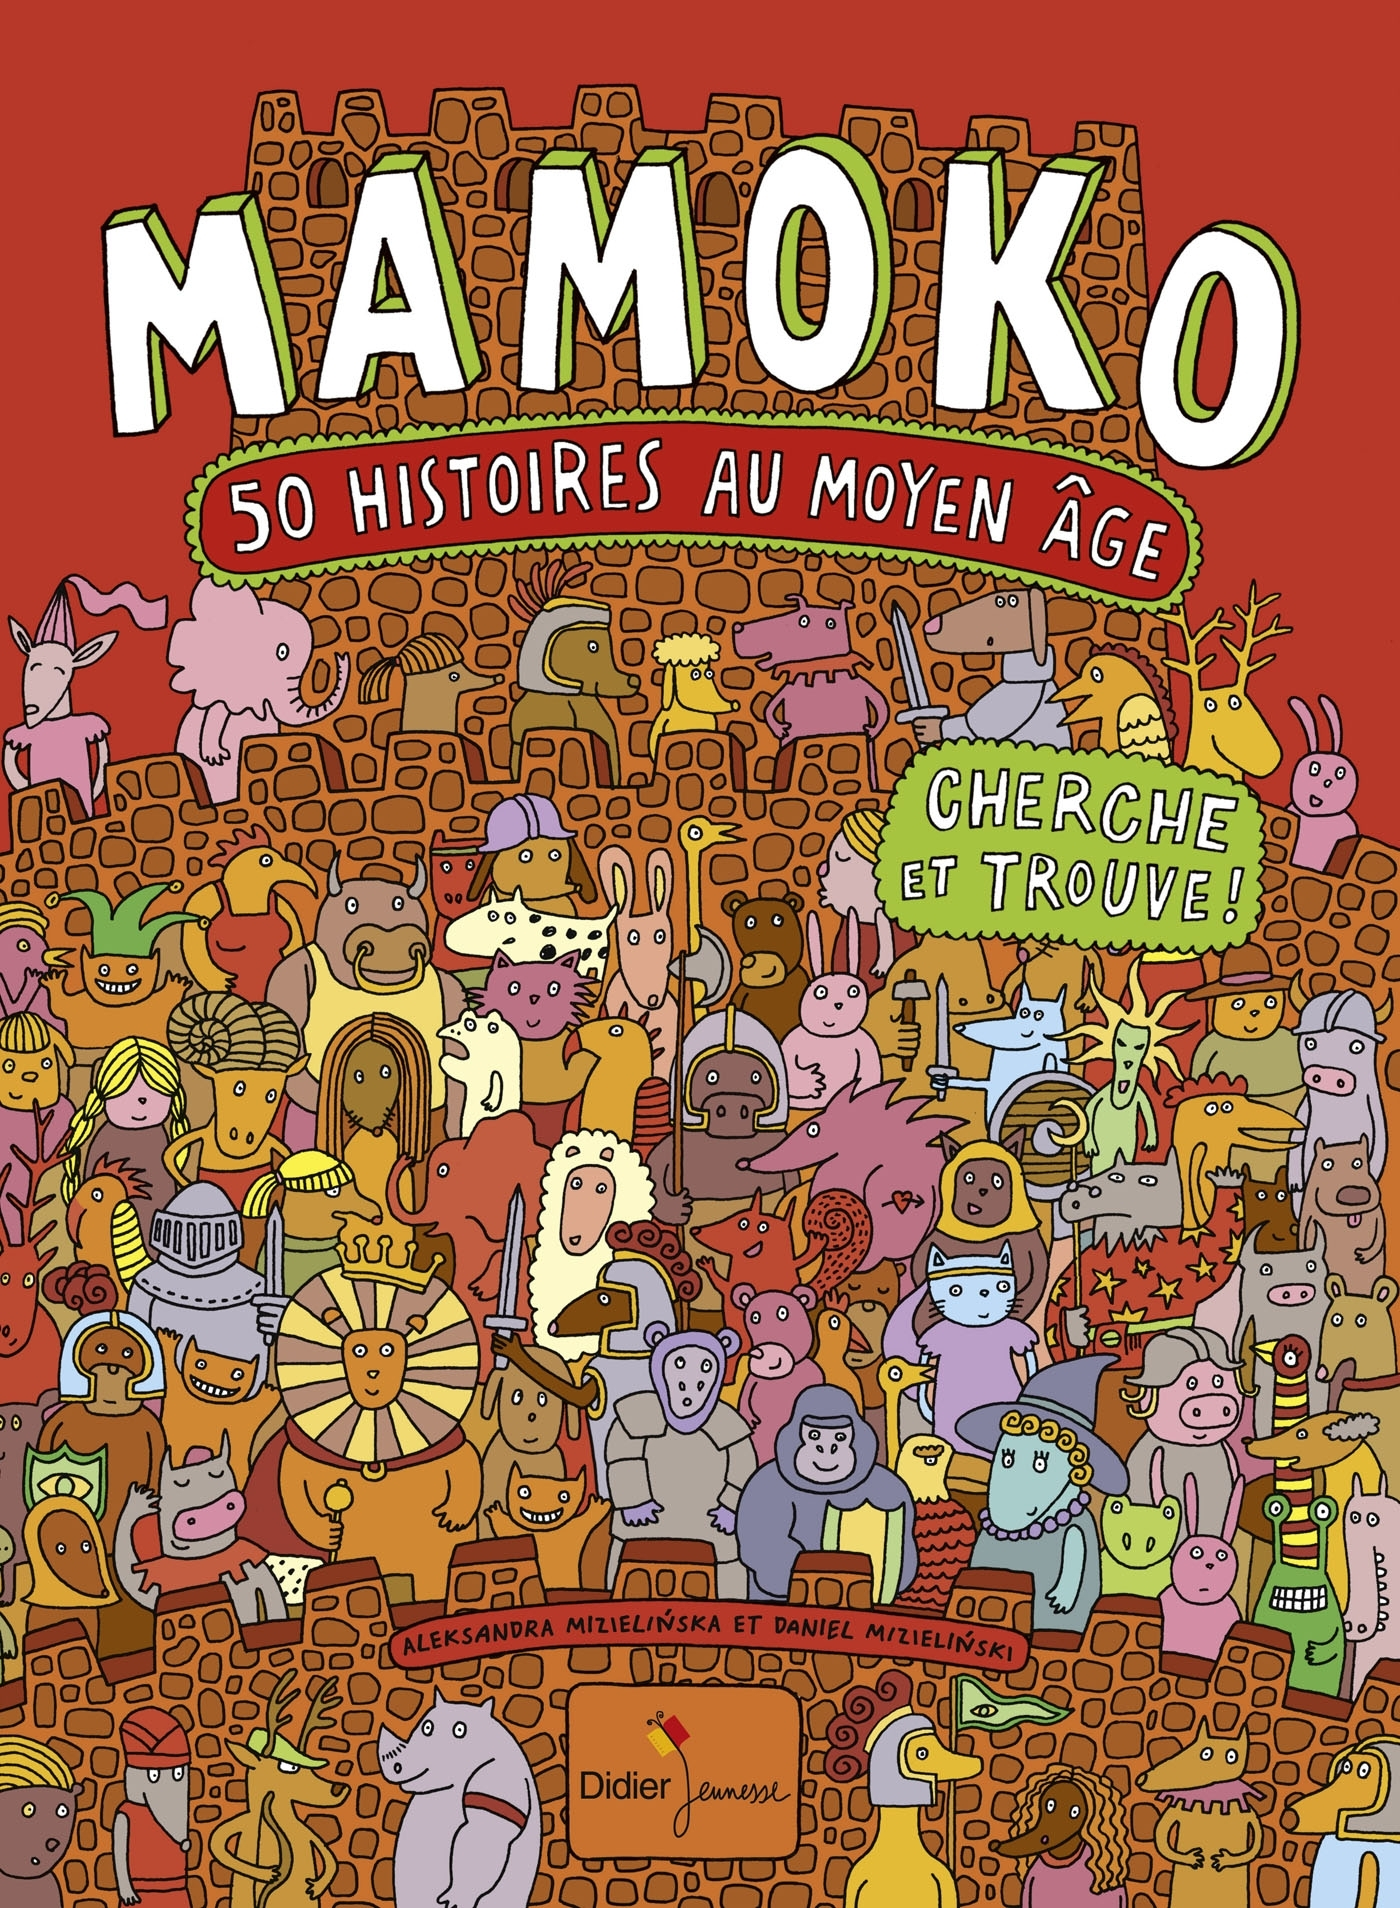 MAMOKO, 50 HISTOIRES AU MOYEN AGE